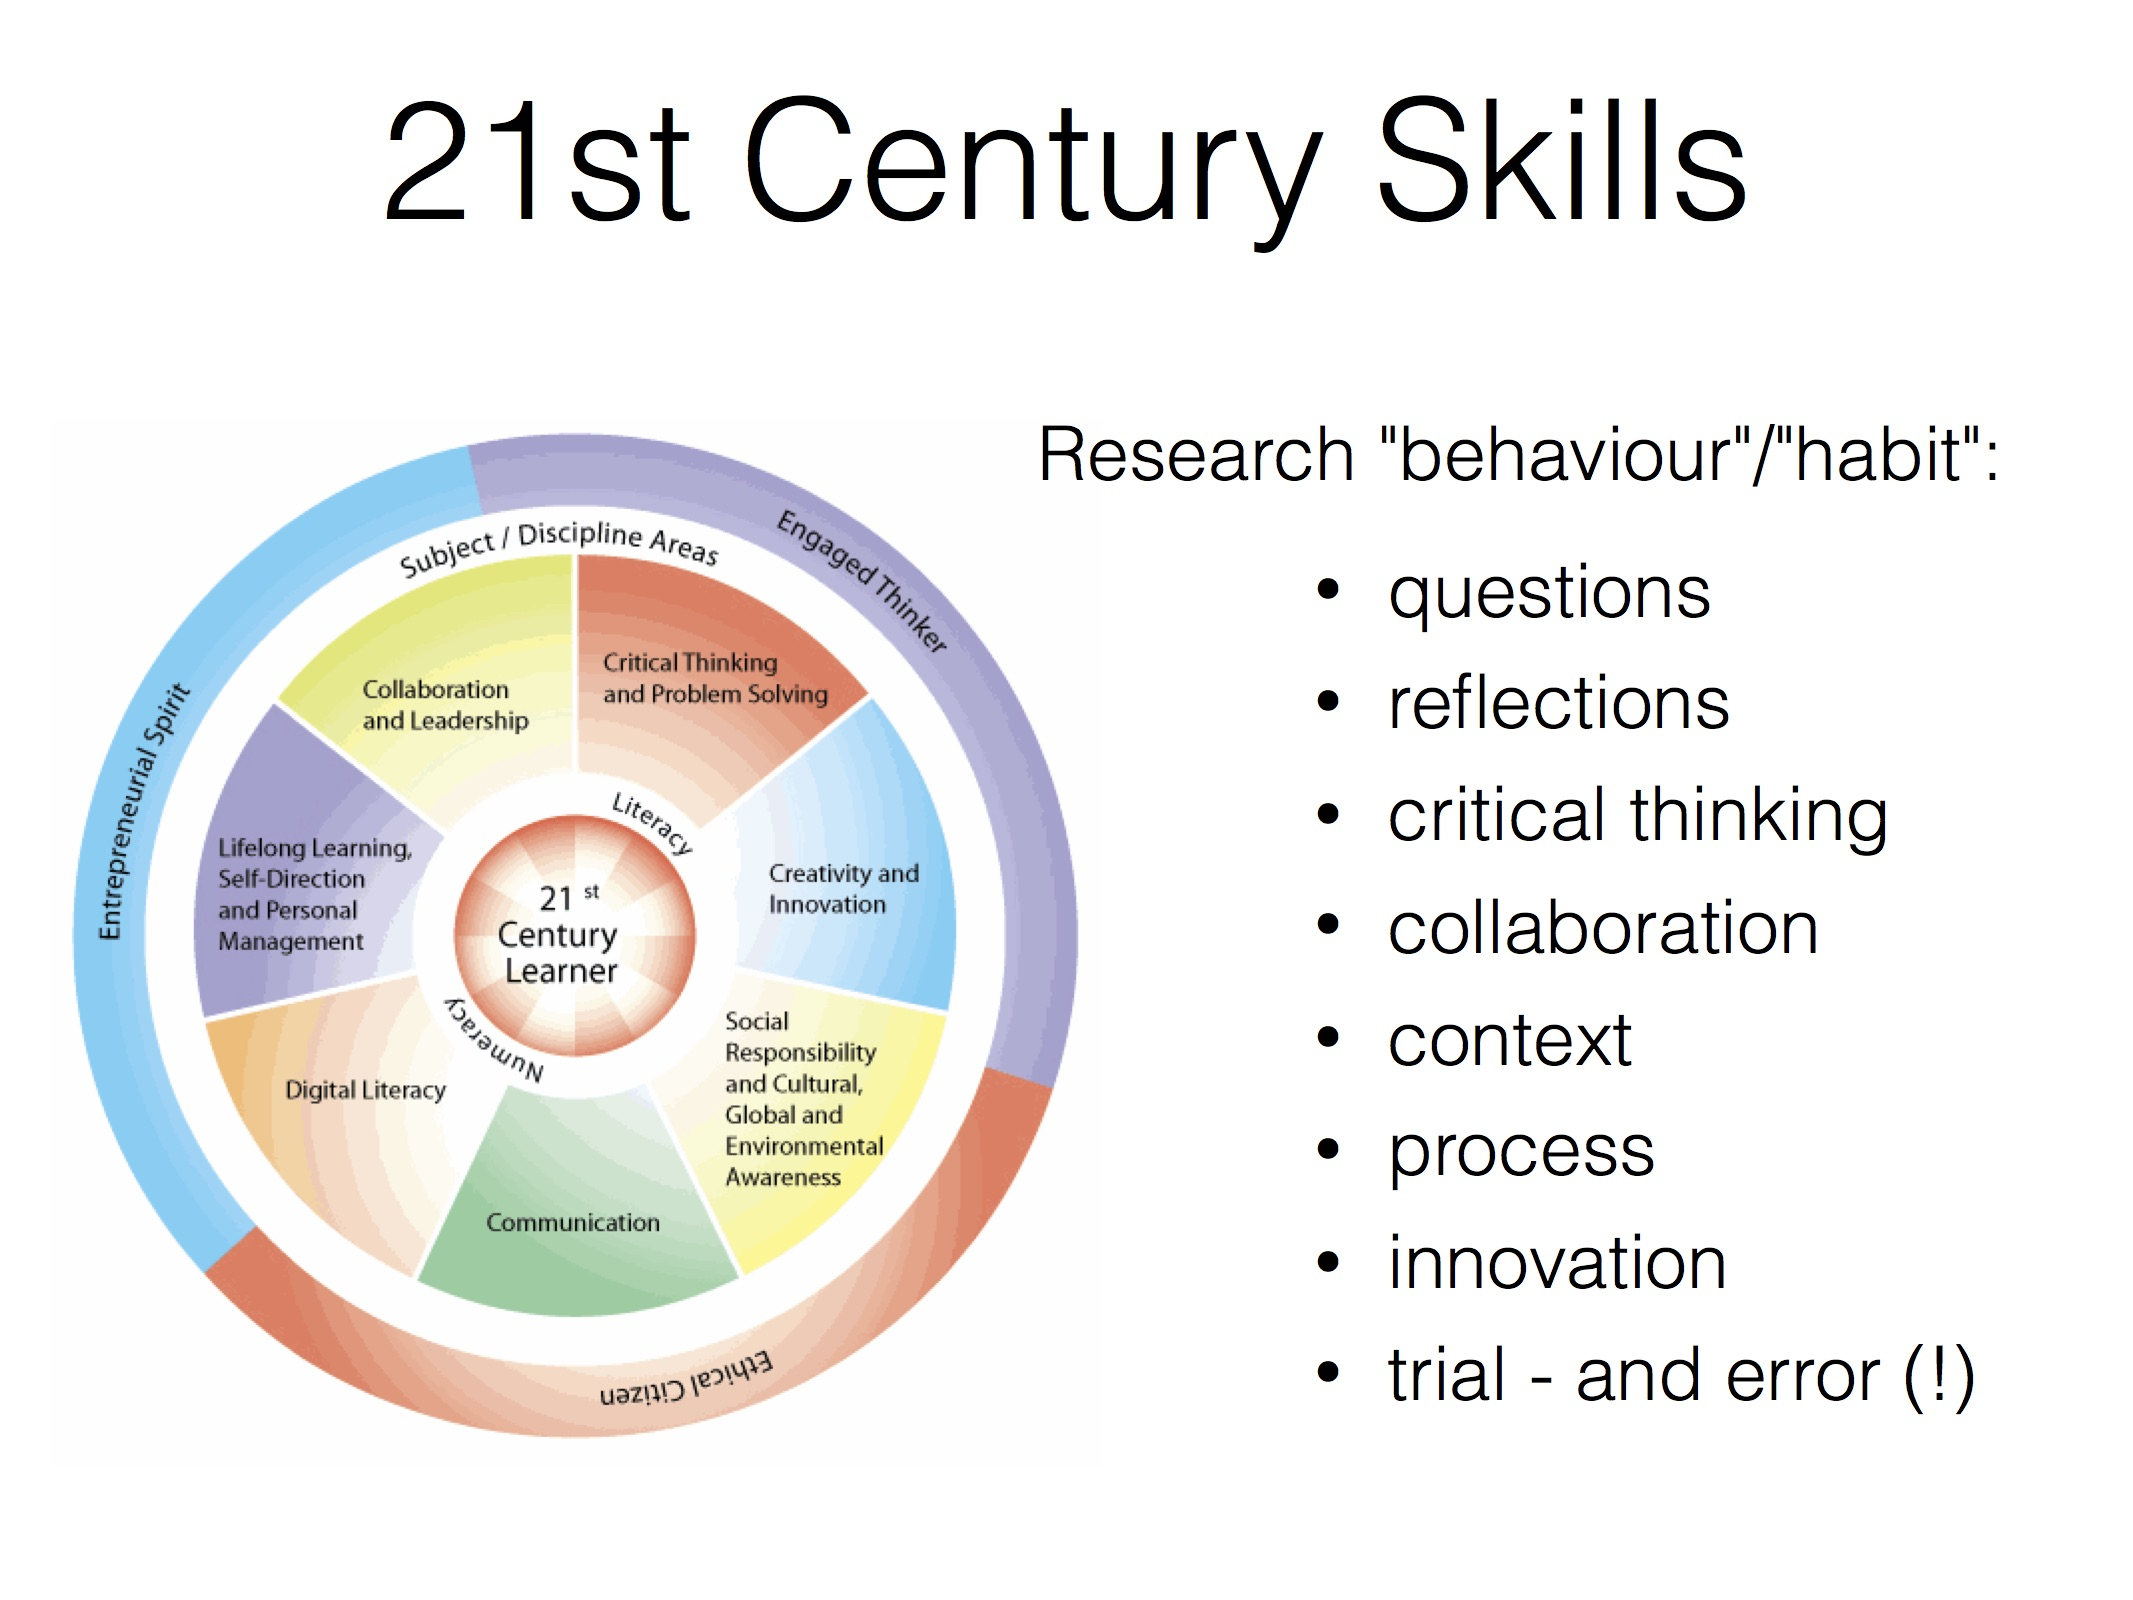 21st C Skills.jpg